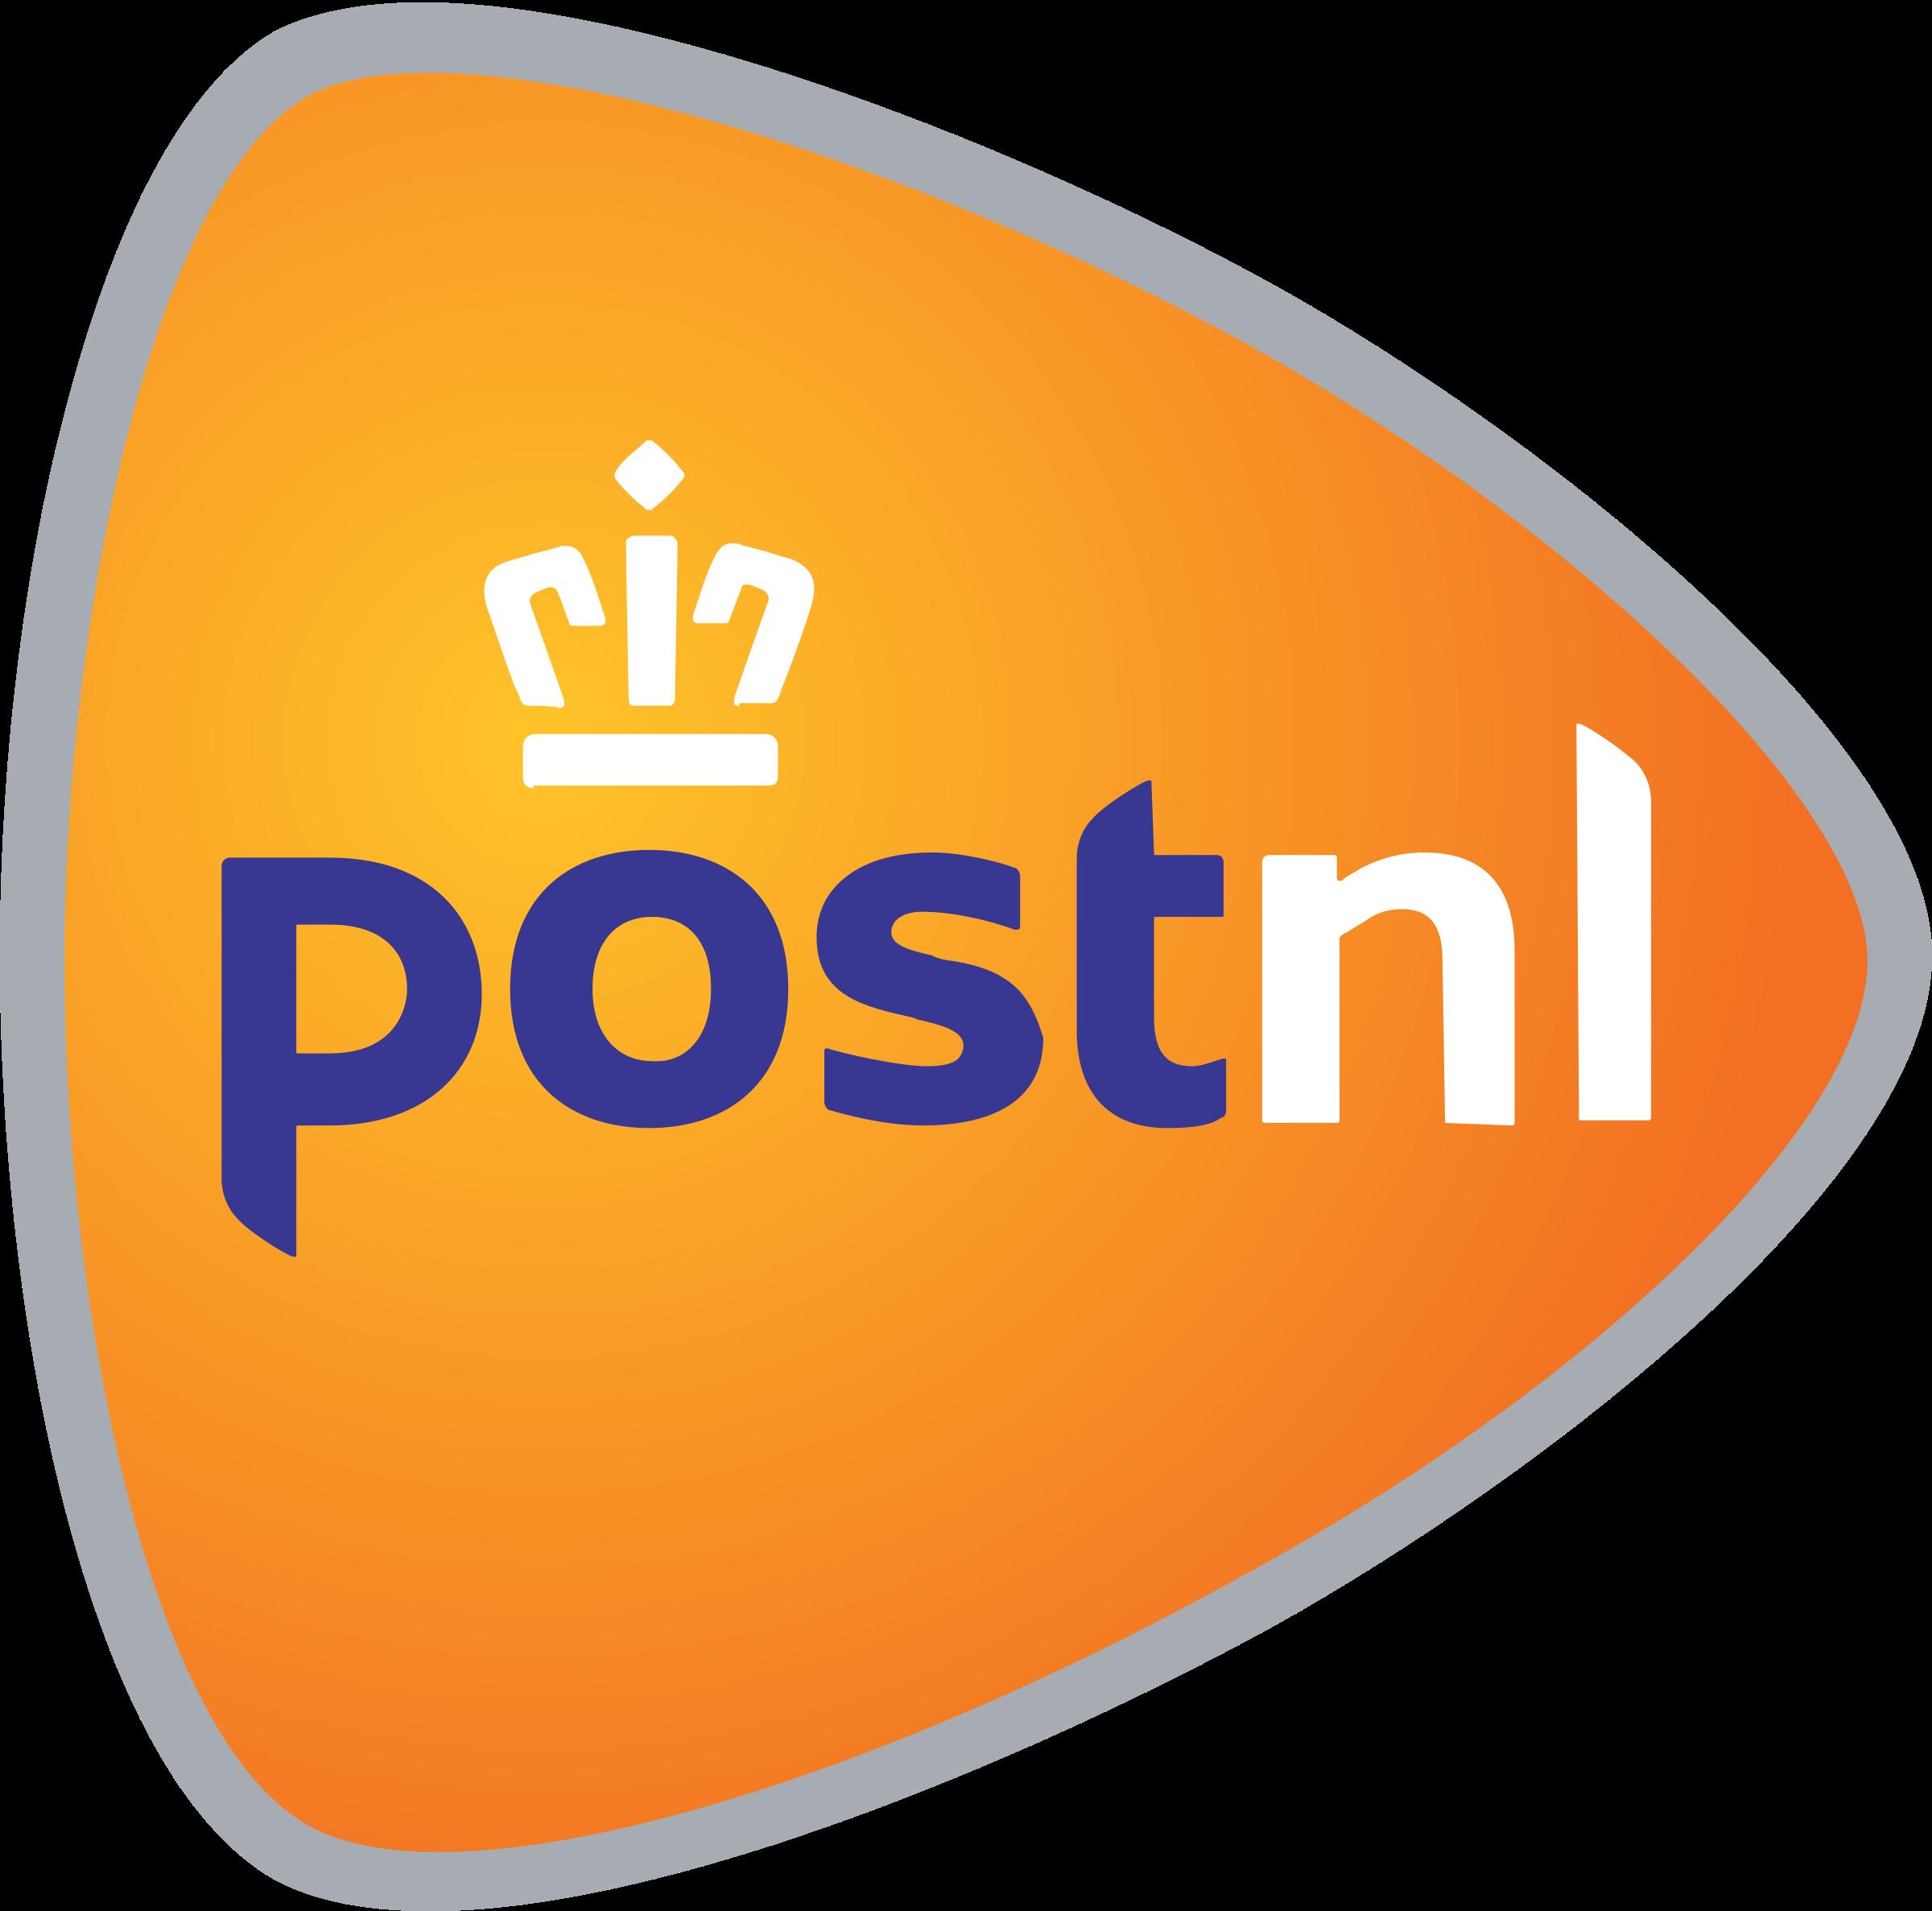 postnl-3-logo-png-transparent.png